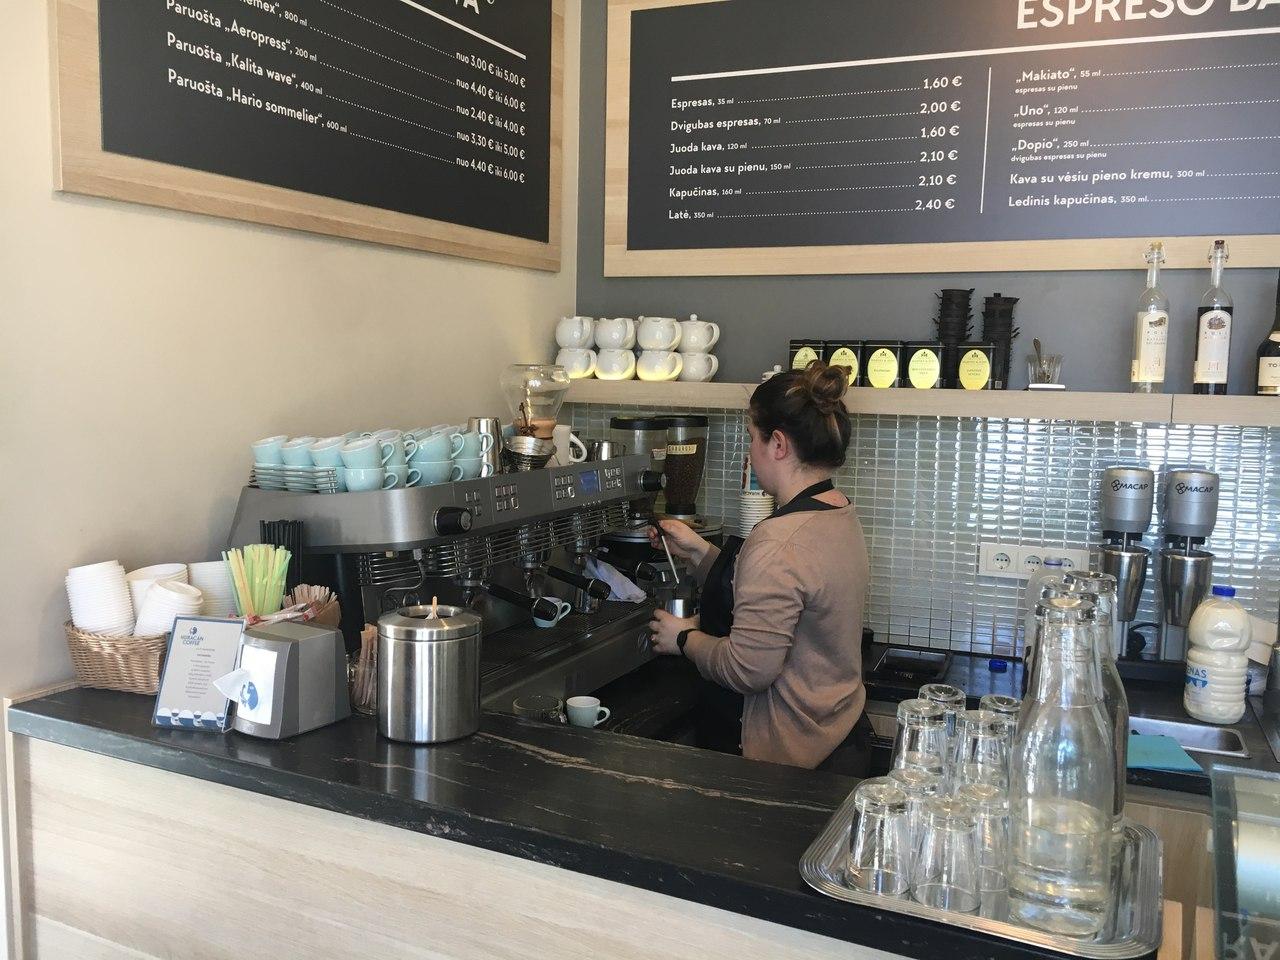 Кофемашина DalaCorte, кофемолка на 2 бункера